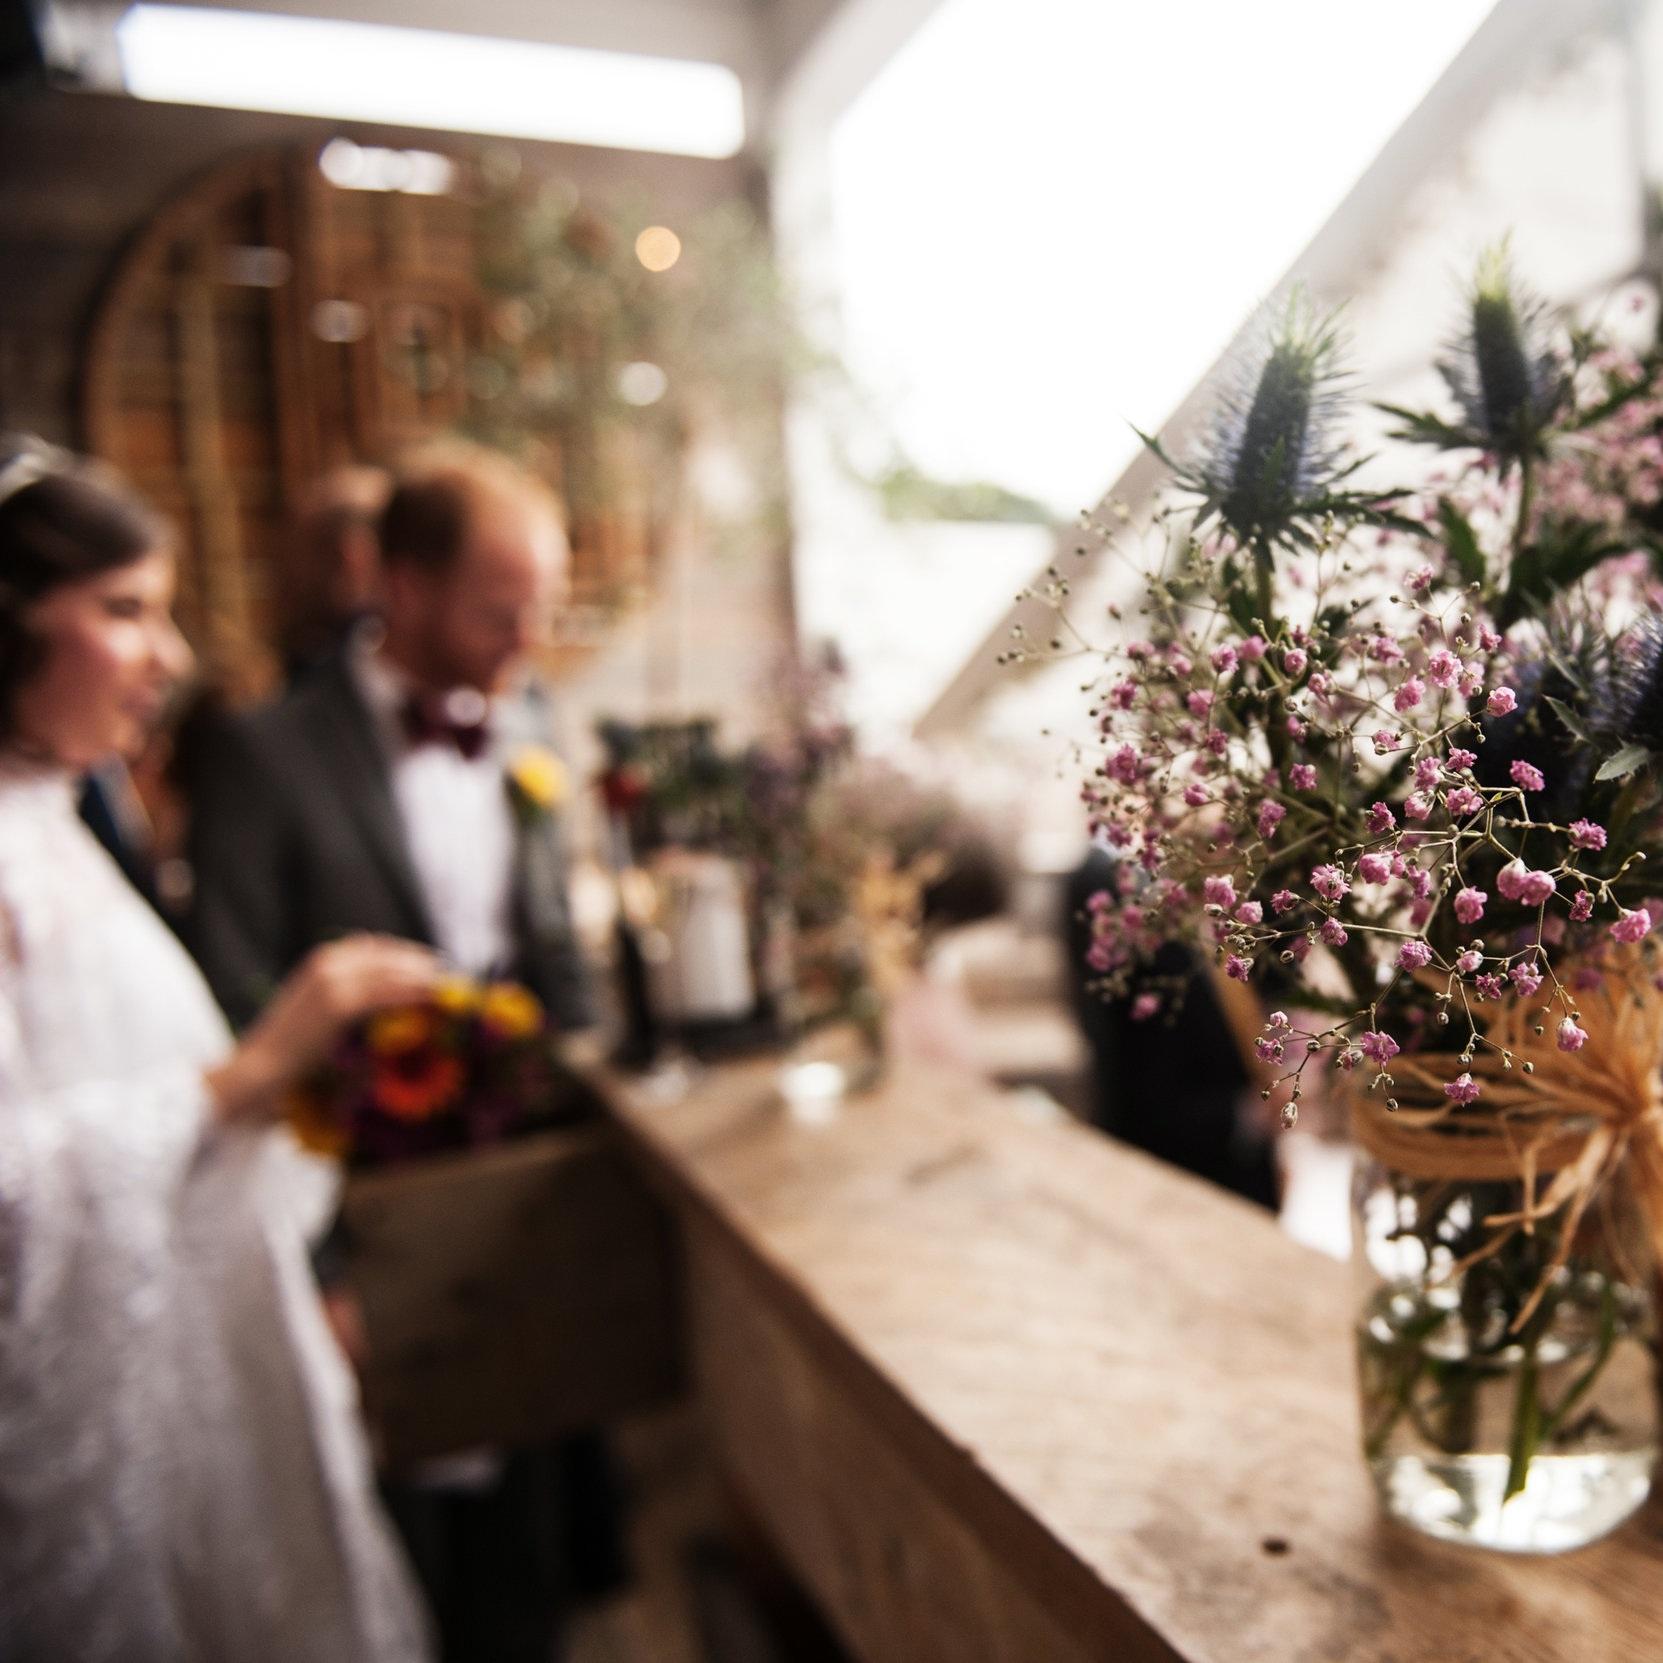 - A hackney warehouse wedding